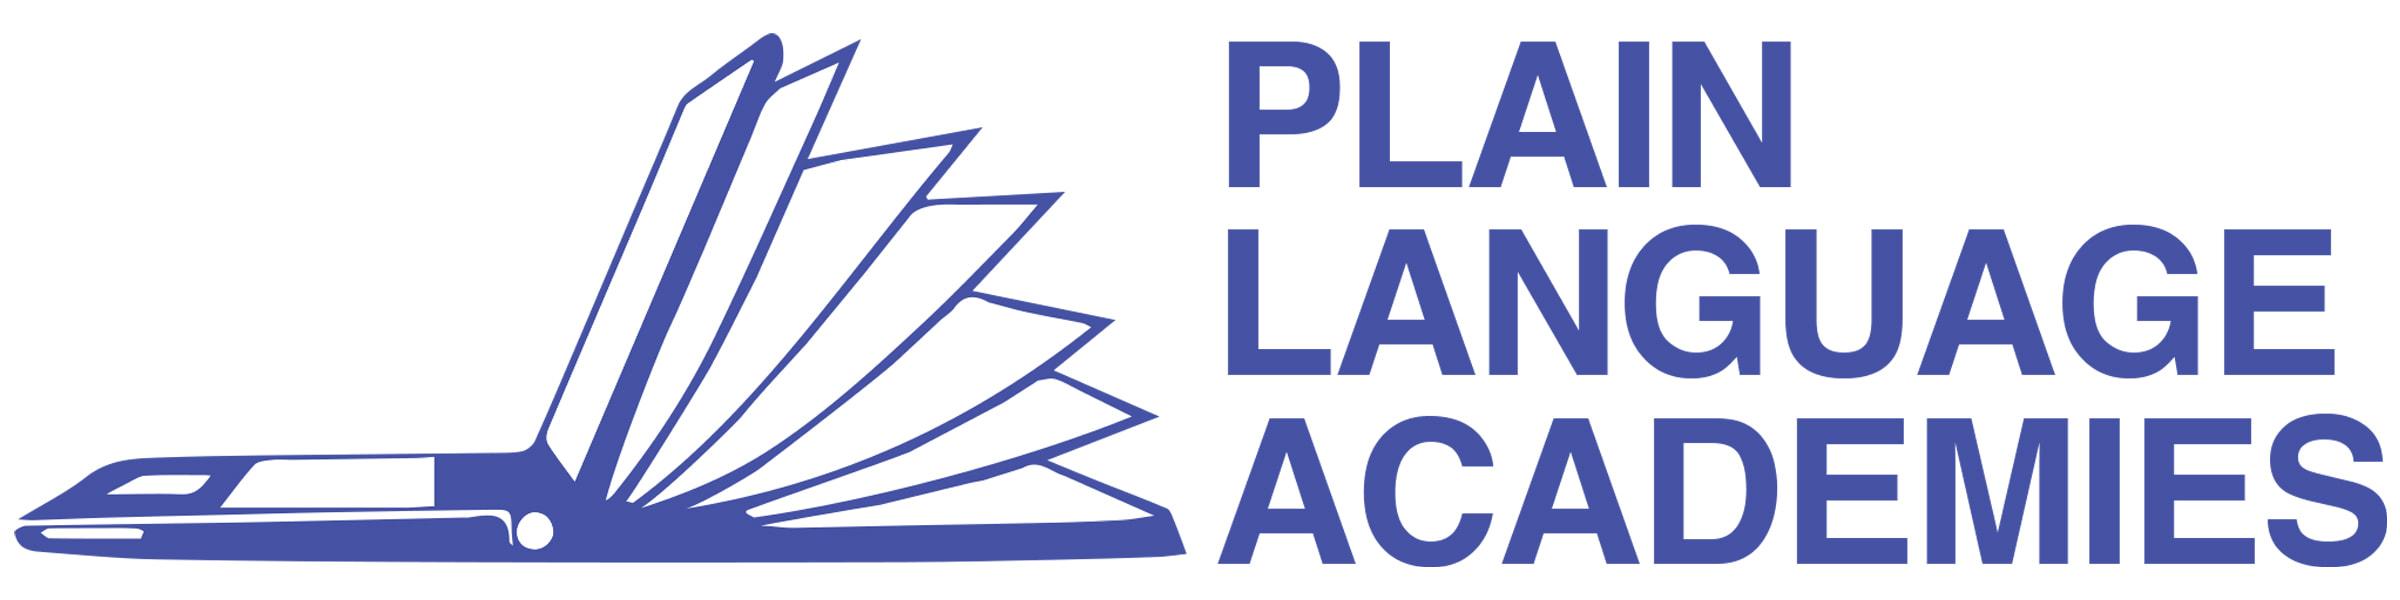 Plain language Academies